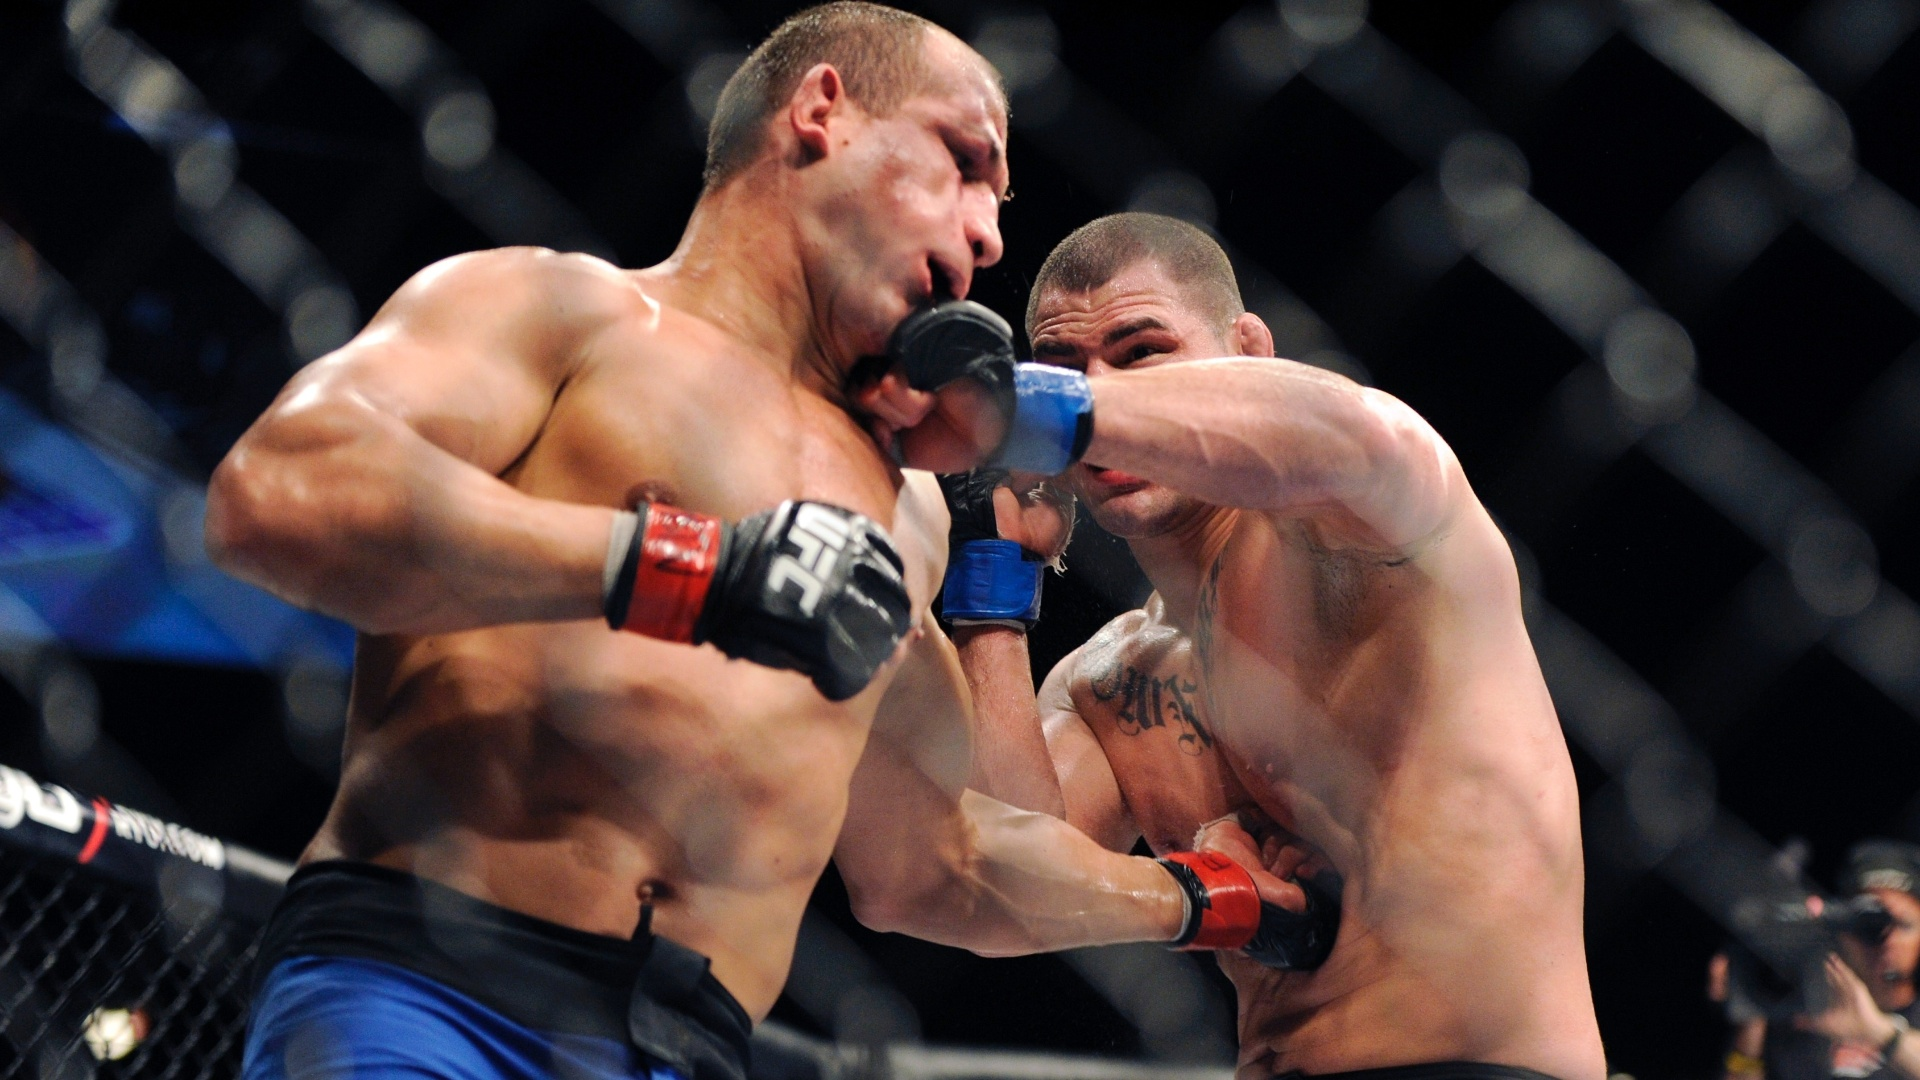 Luta completa UFC 155: Dos Santos vs Velasquez